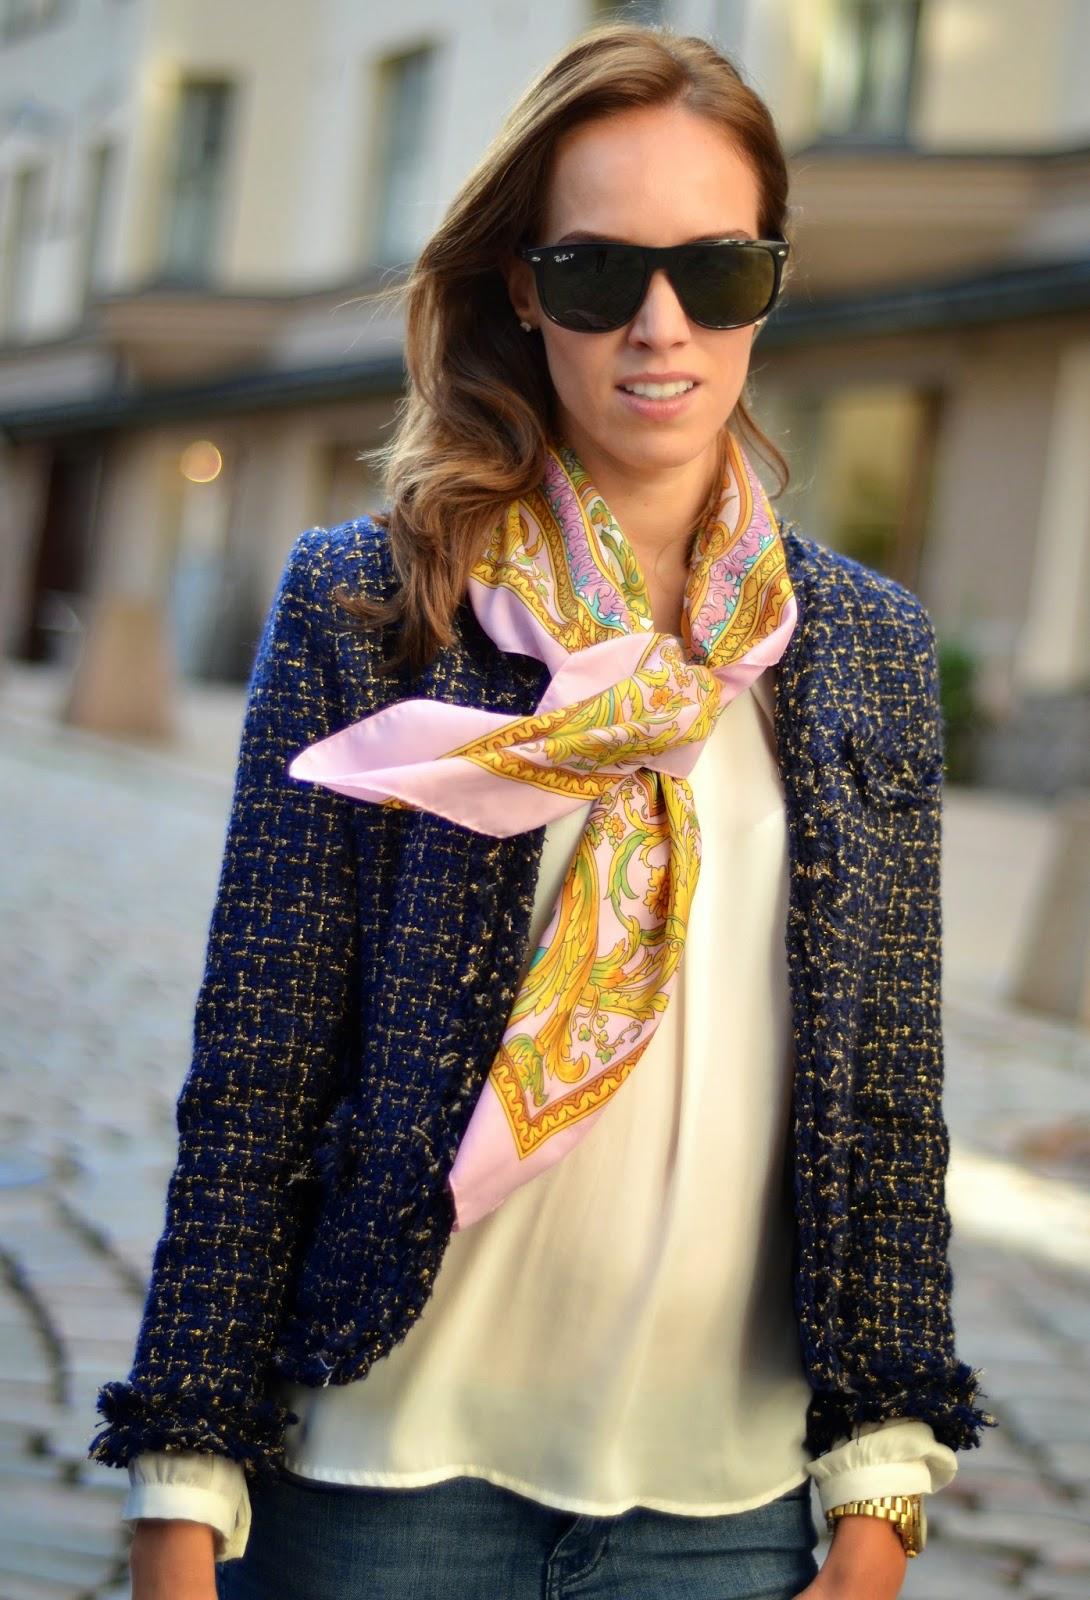 ray-ban-sunglasses-motivi-silk-scarf-sheinside-blazer